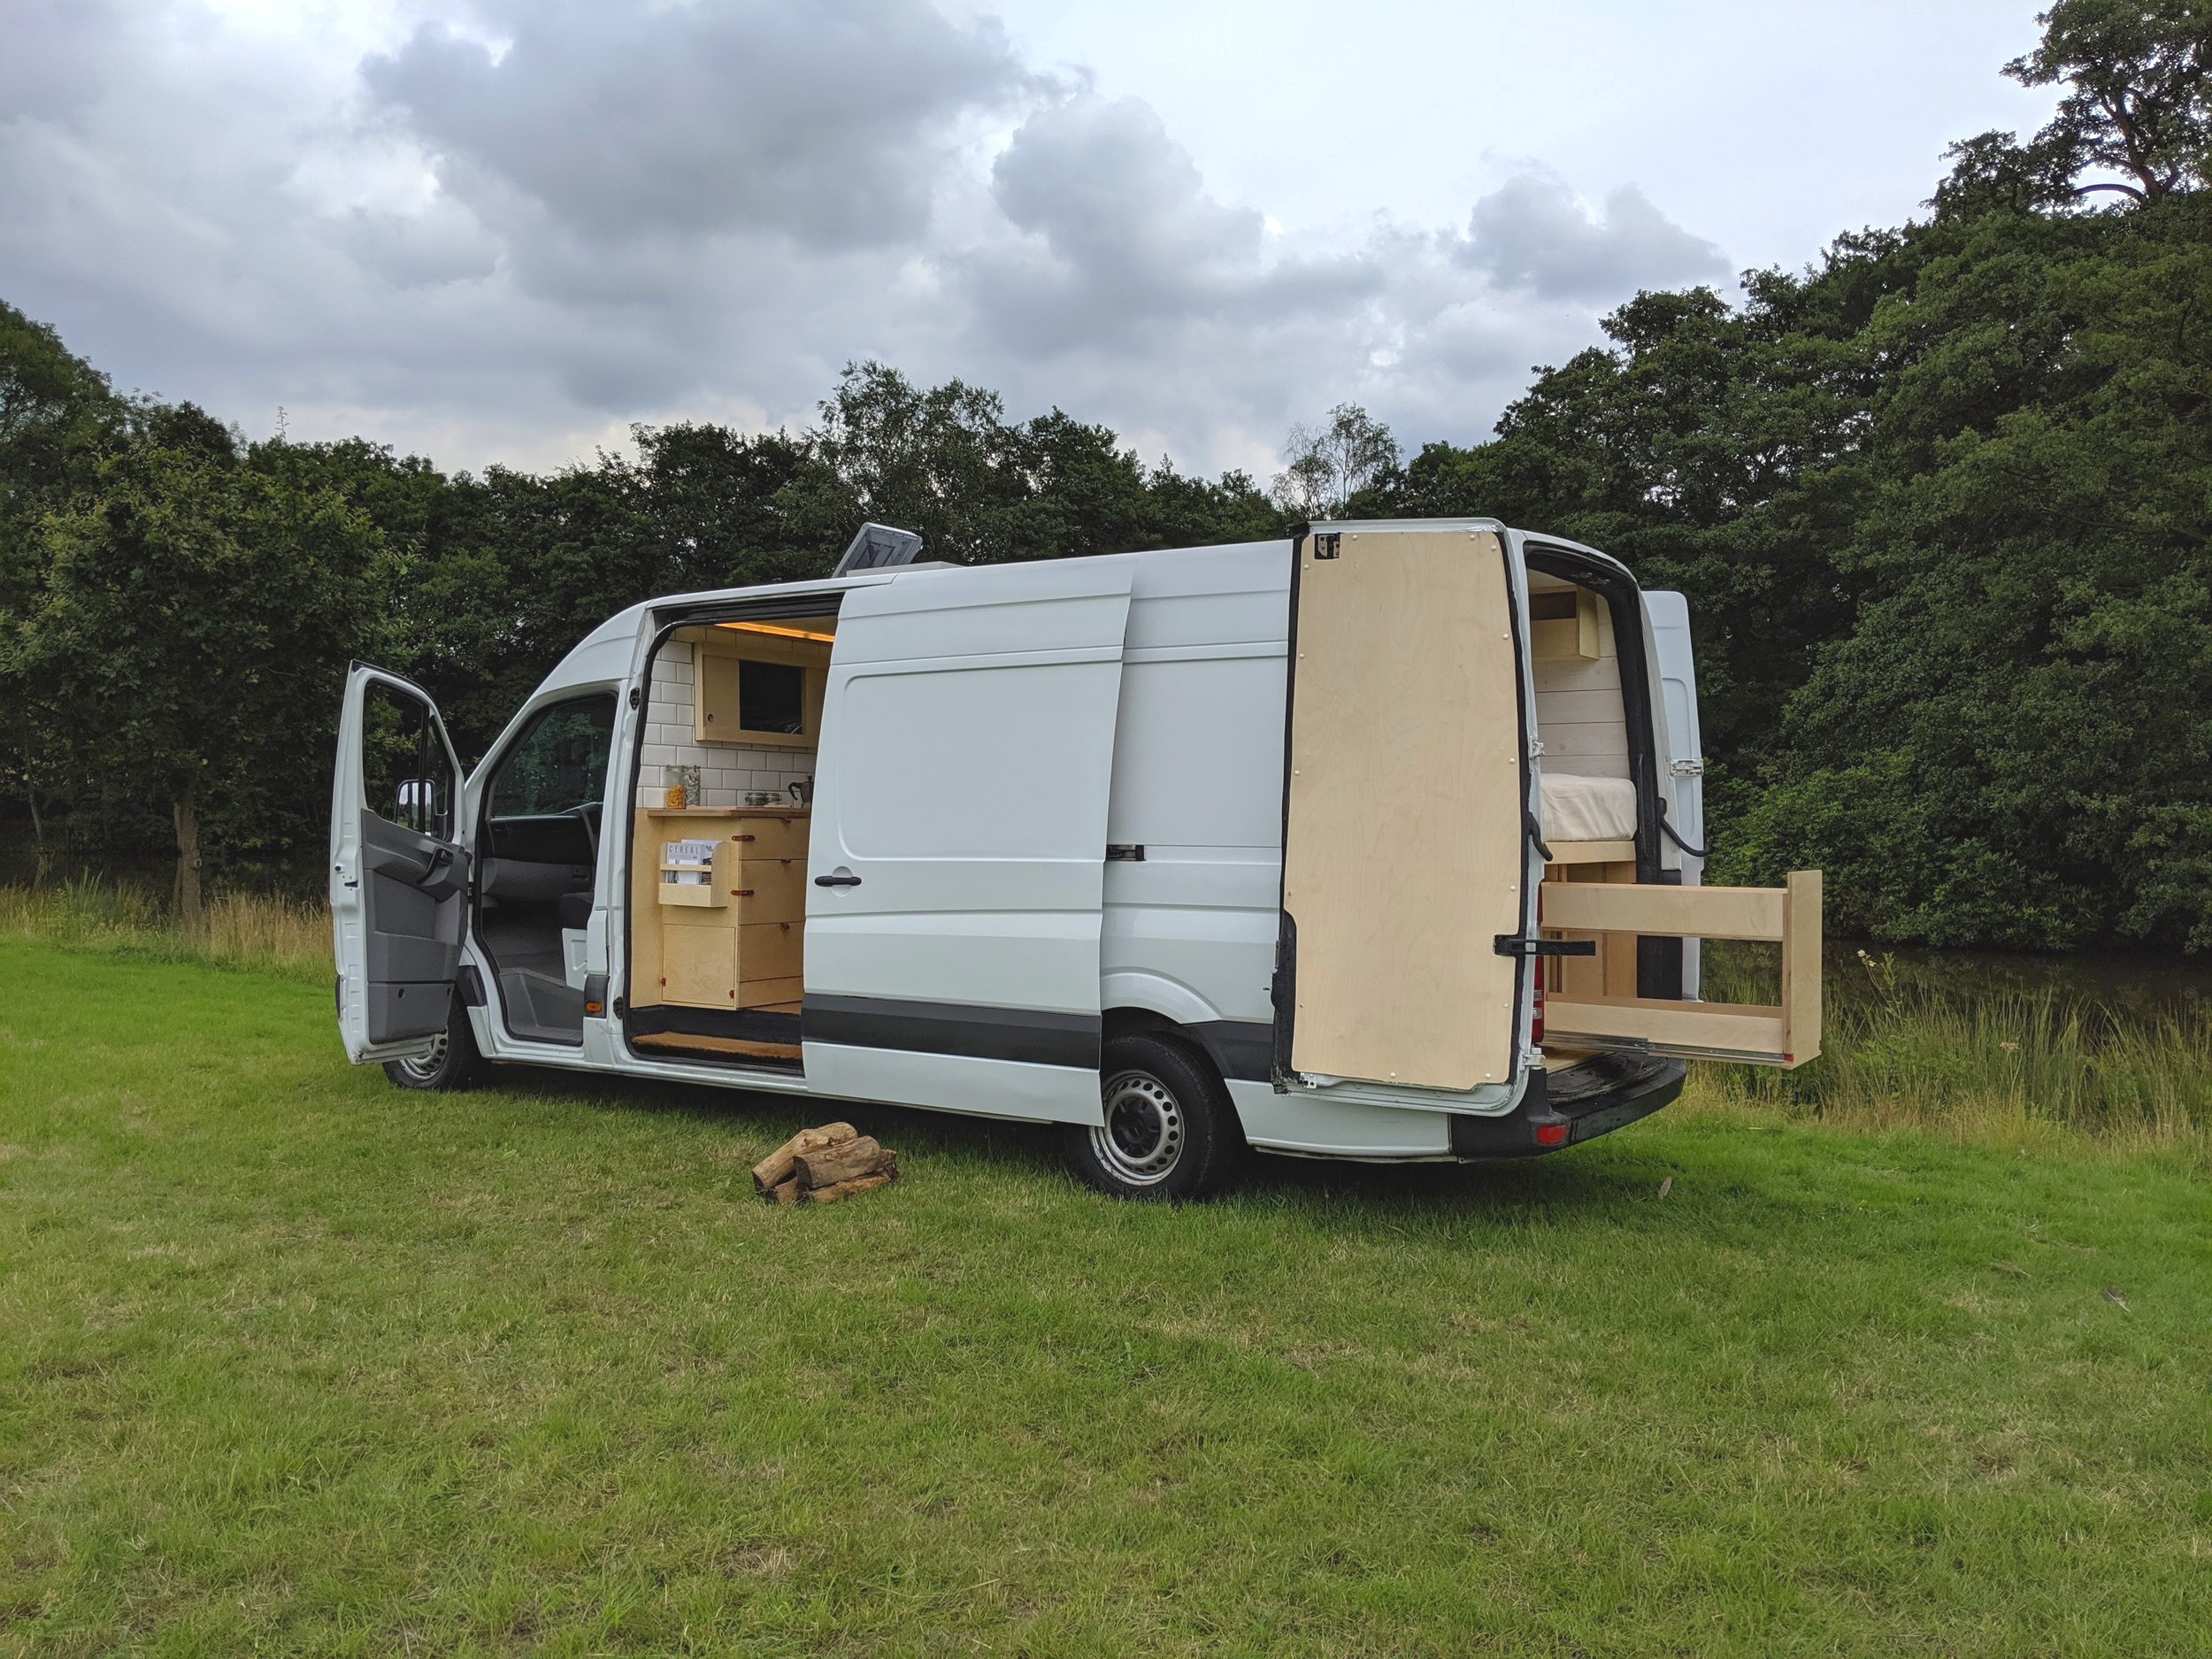 OOOD van outside